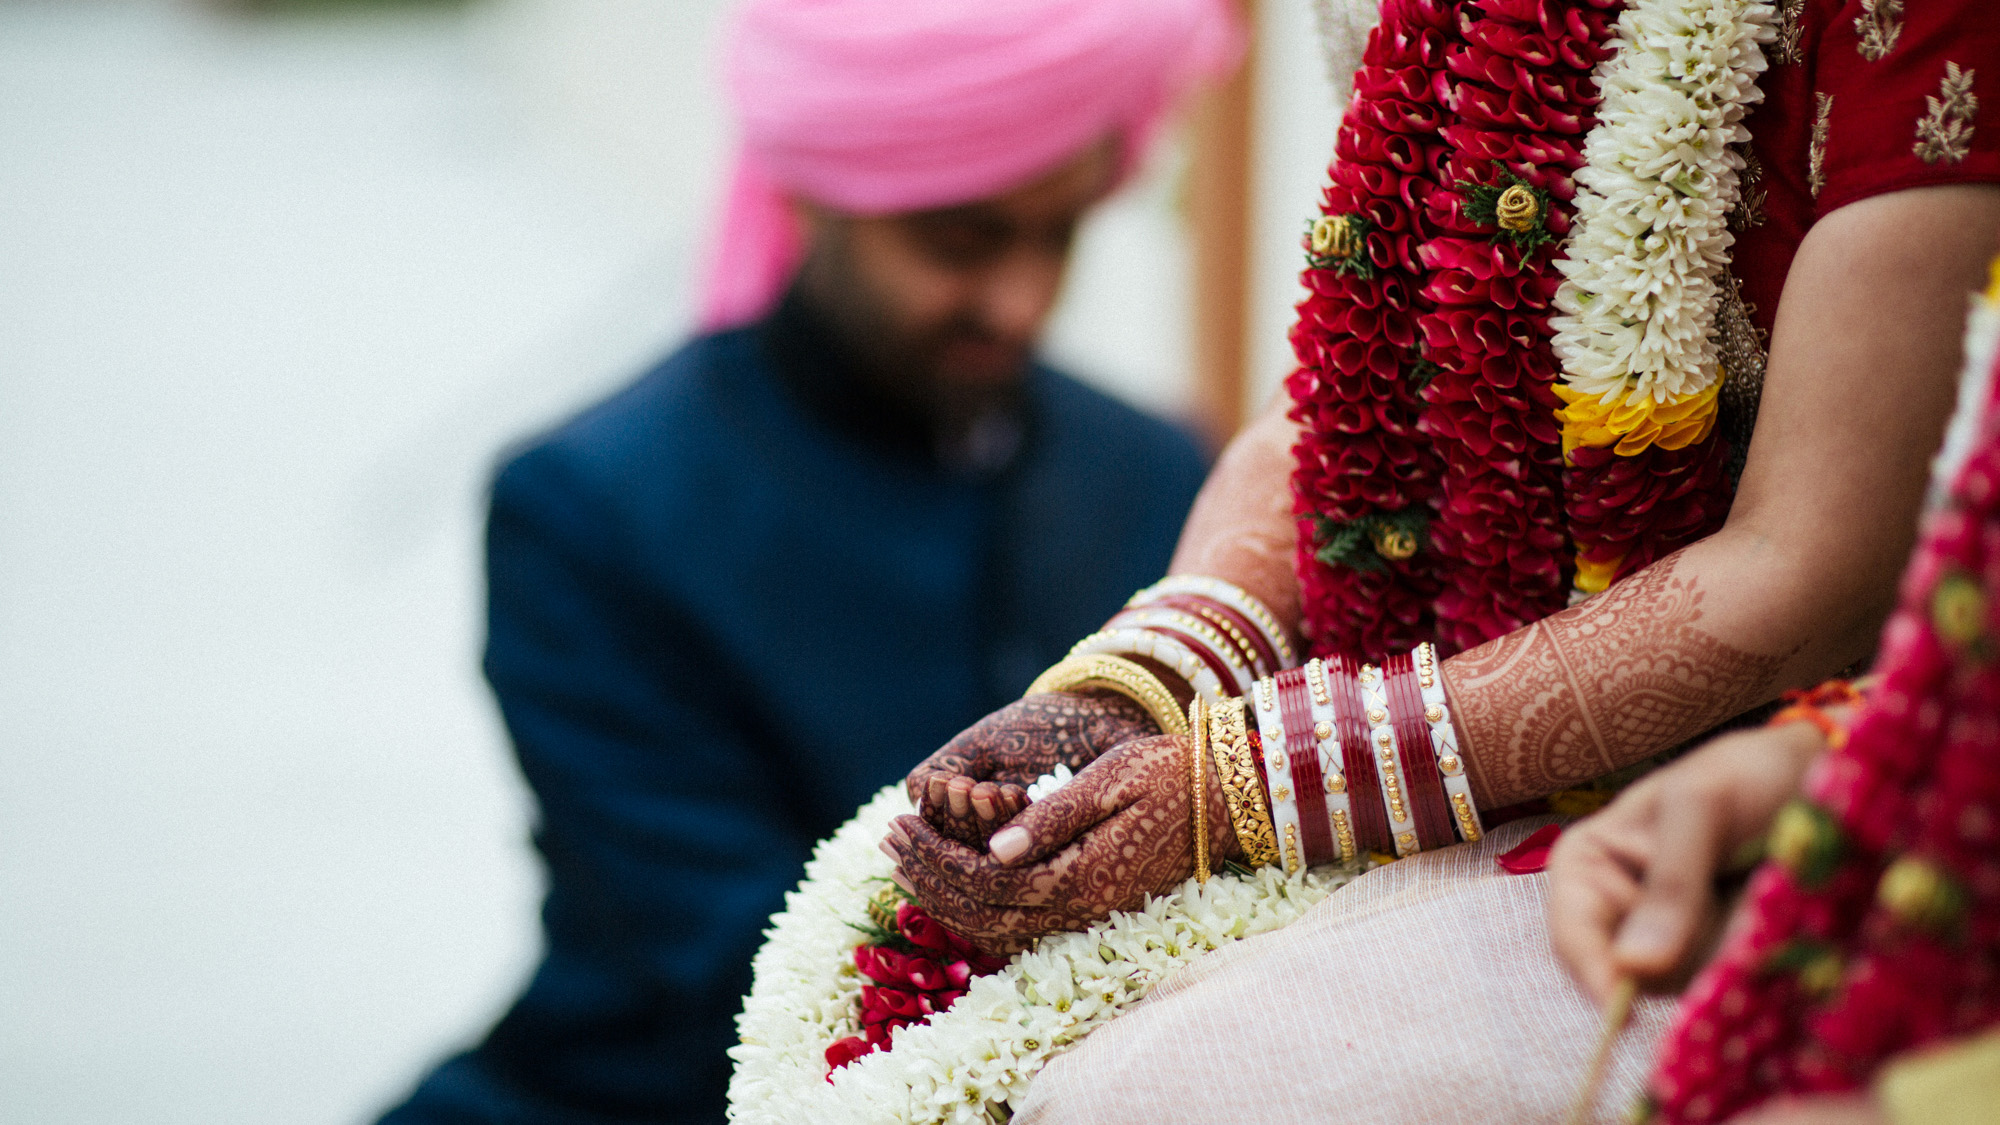 anu_maneesh_alec_vanderboom_Indian_wedding_photography-0108.jpg